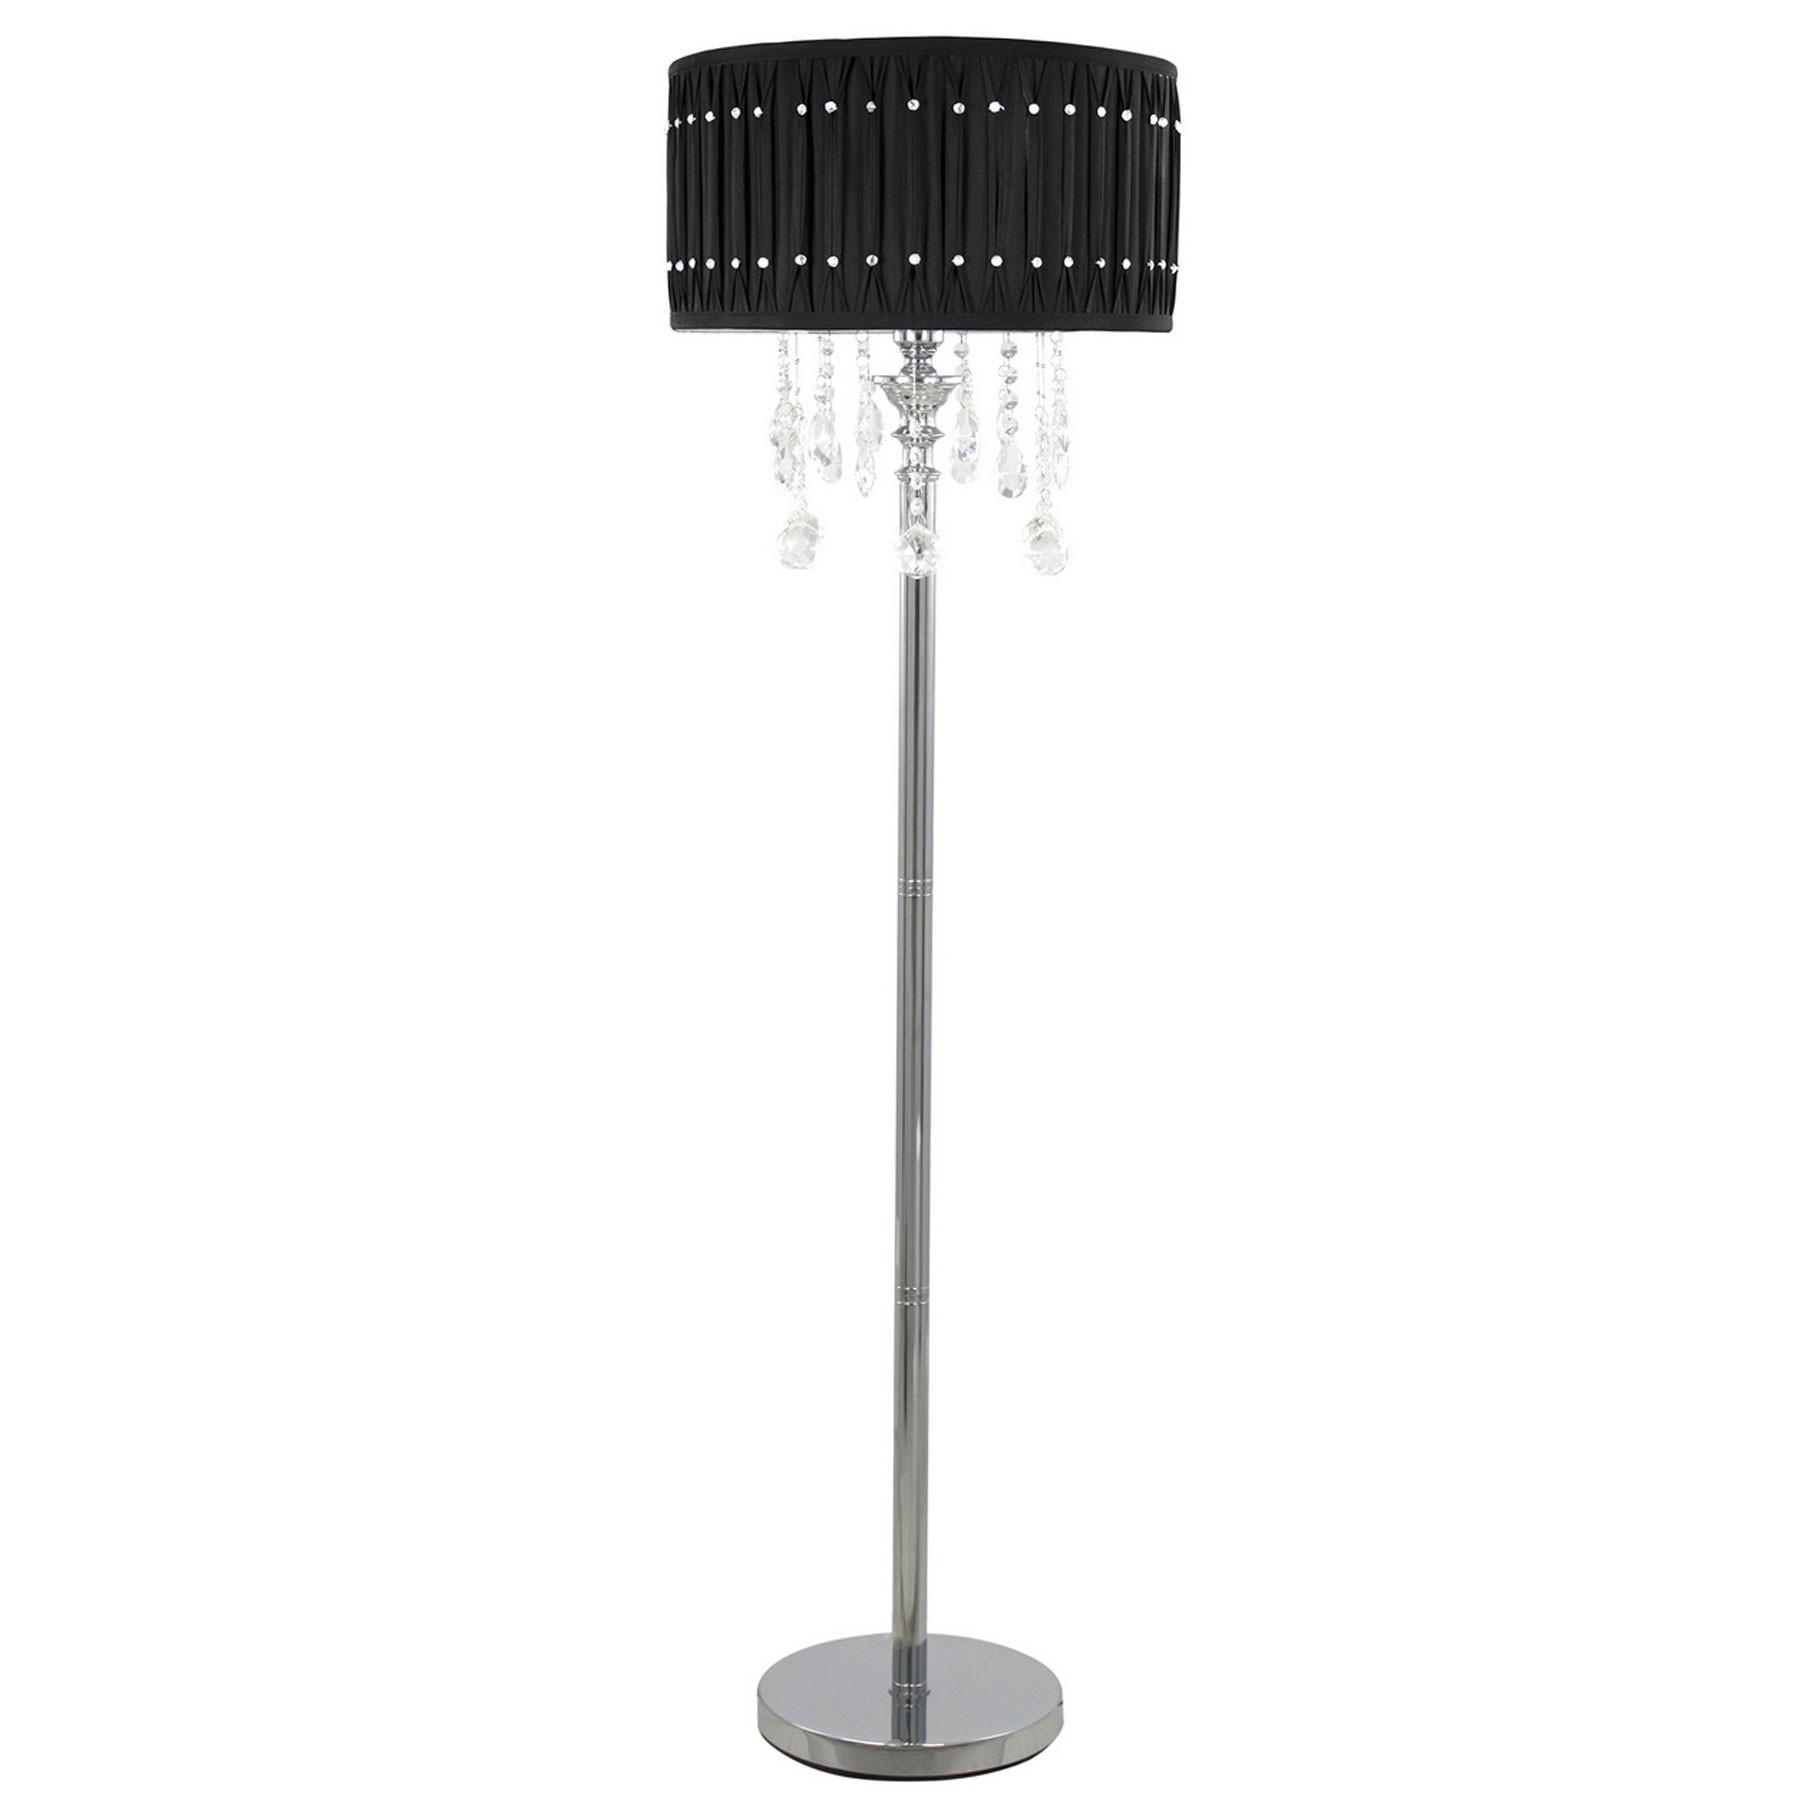 Lights Bling Floor Lamp Crystal Floor Lamp Crystal Chandelier Throughout Standing Chandelier Floor Lamps (Image 14 of 25)